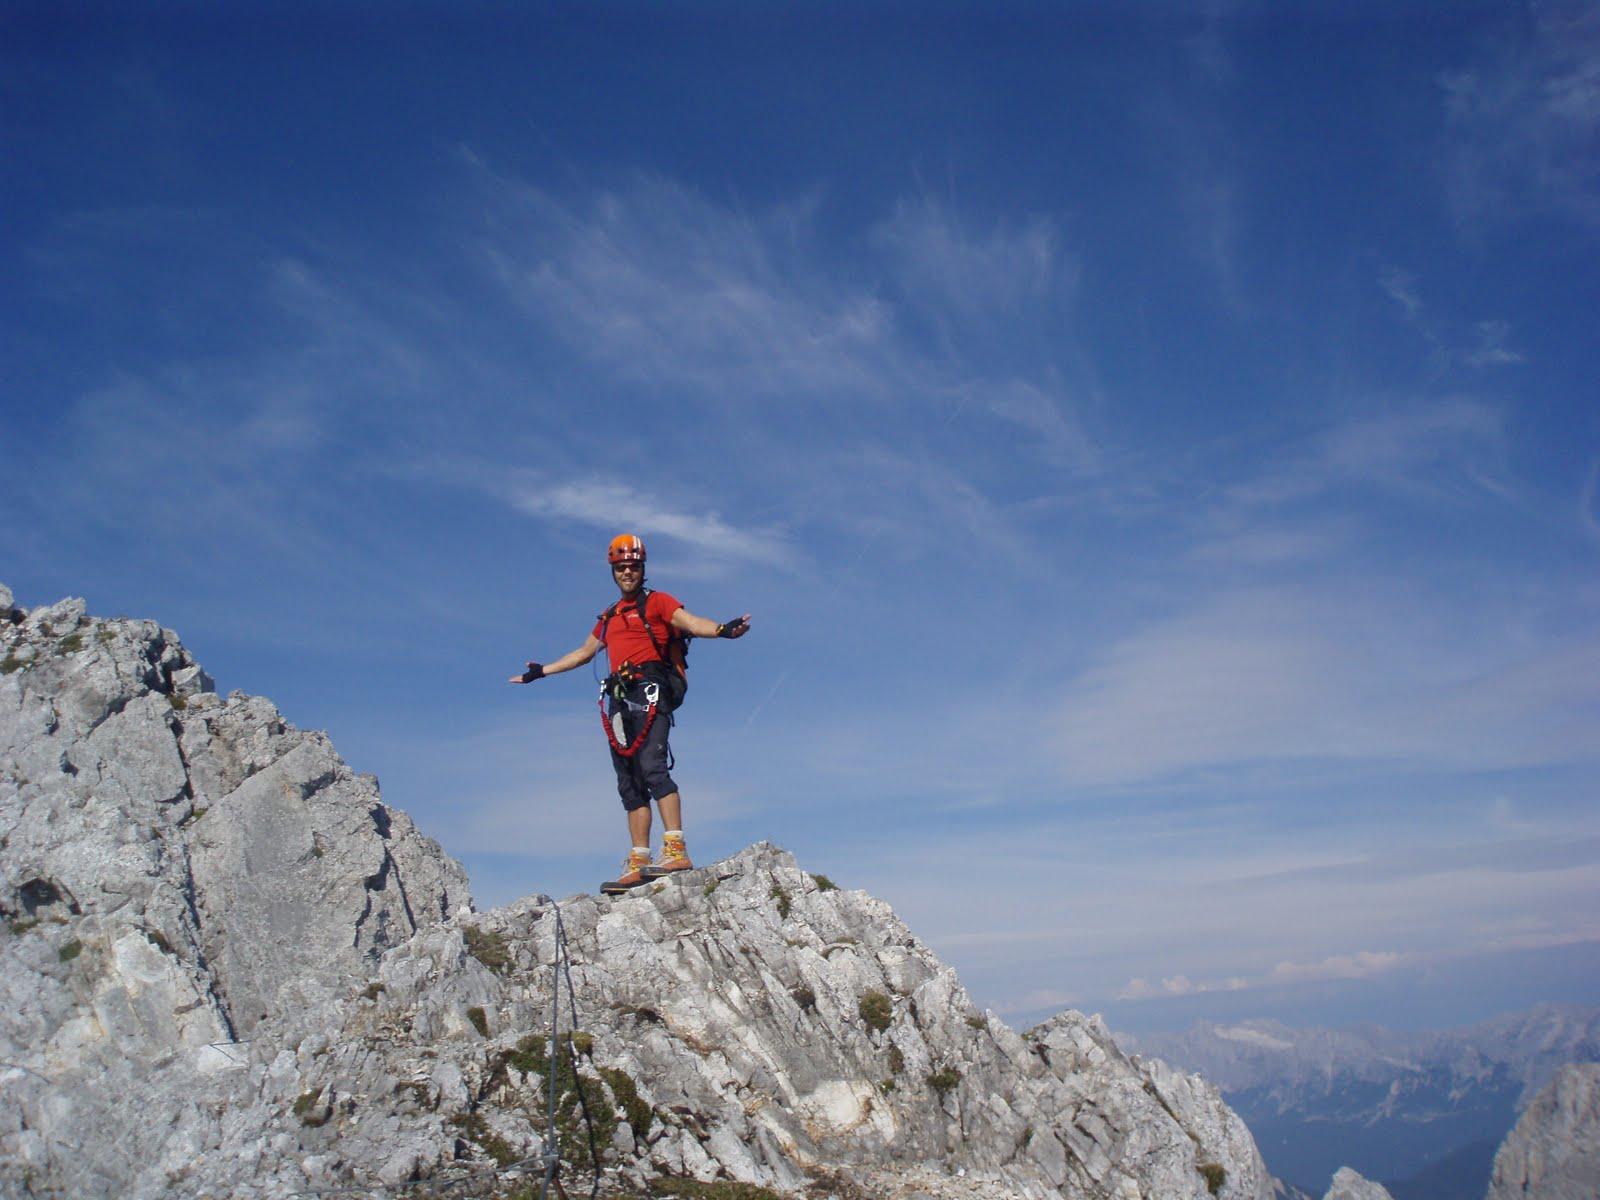 Klettersteig Innsbruck Umgebung : ▸ erlebe den klettersteig am stuibenfall things at